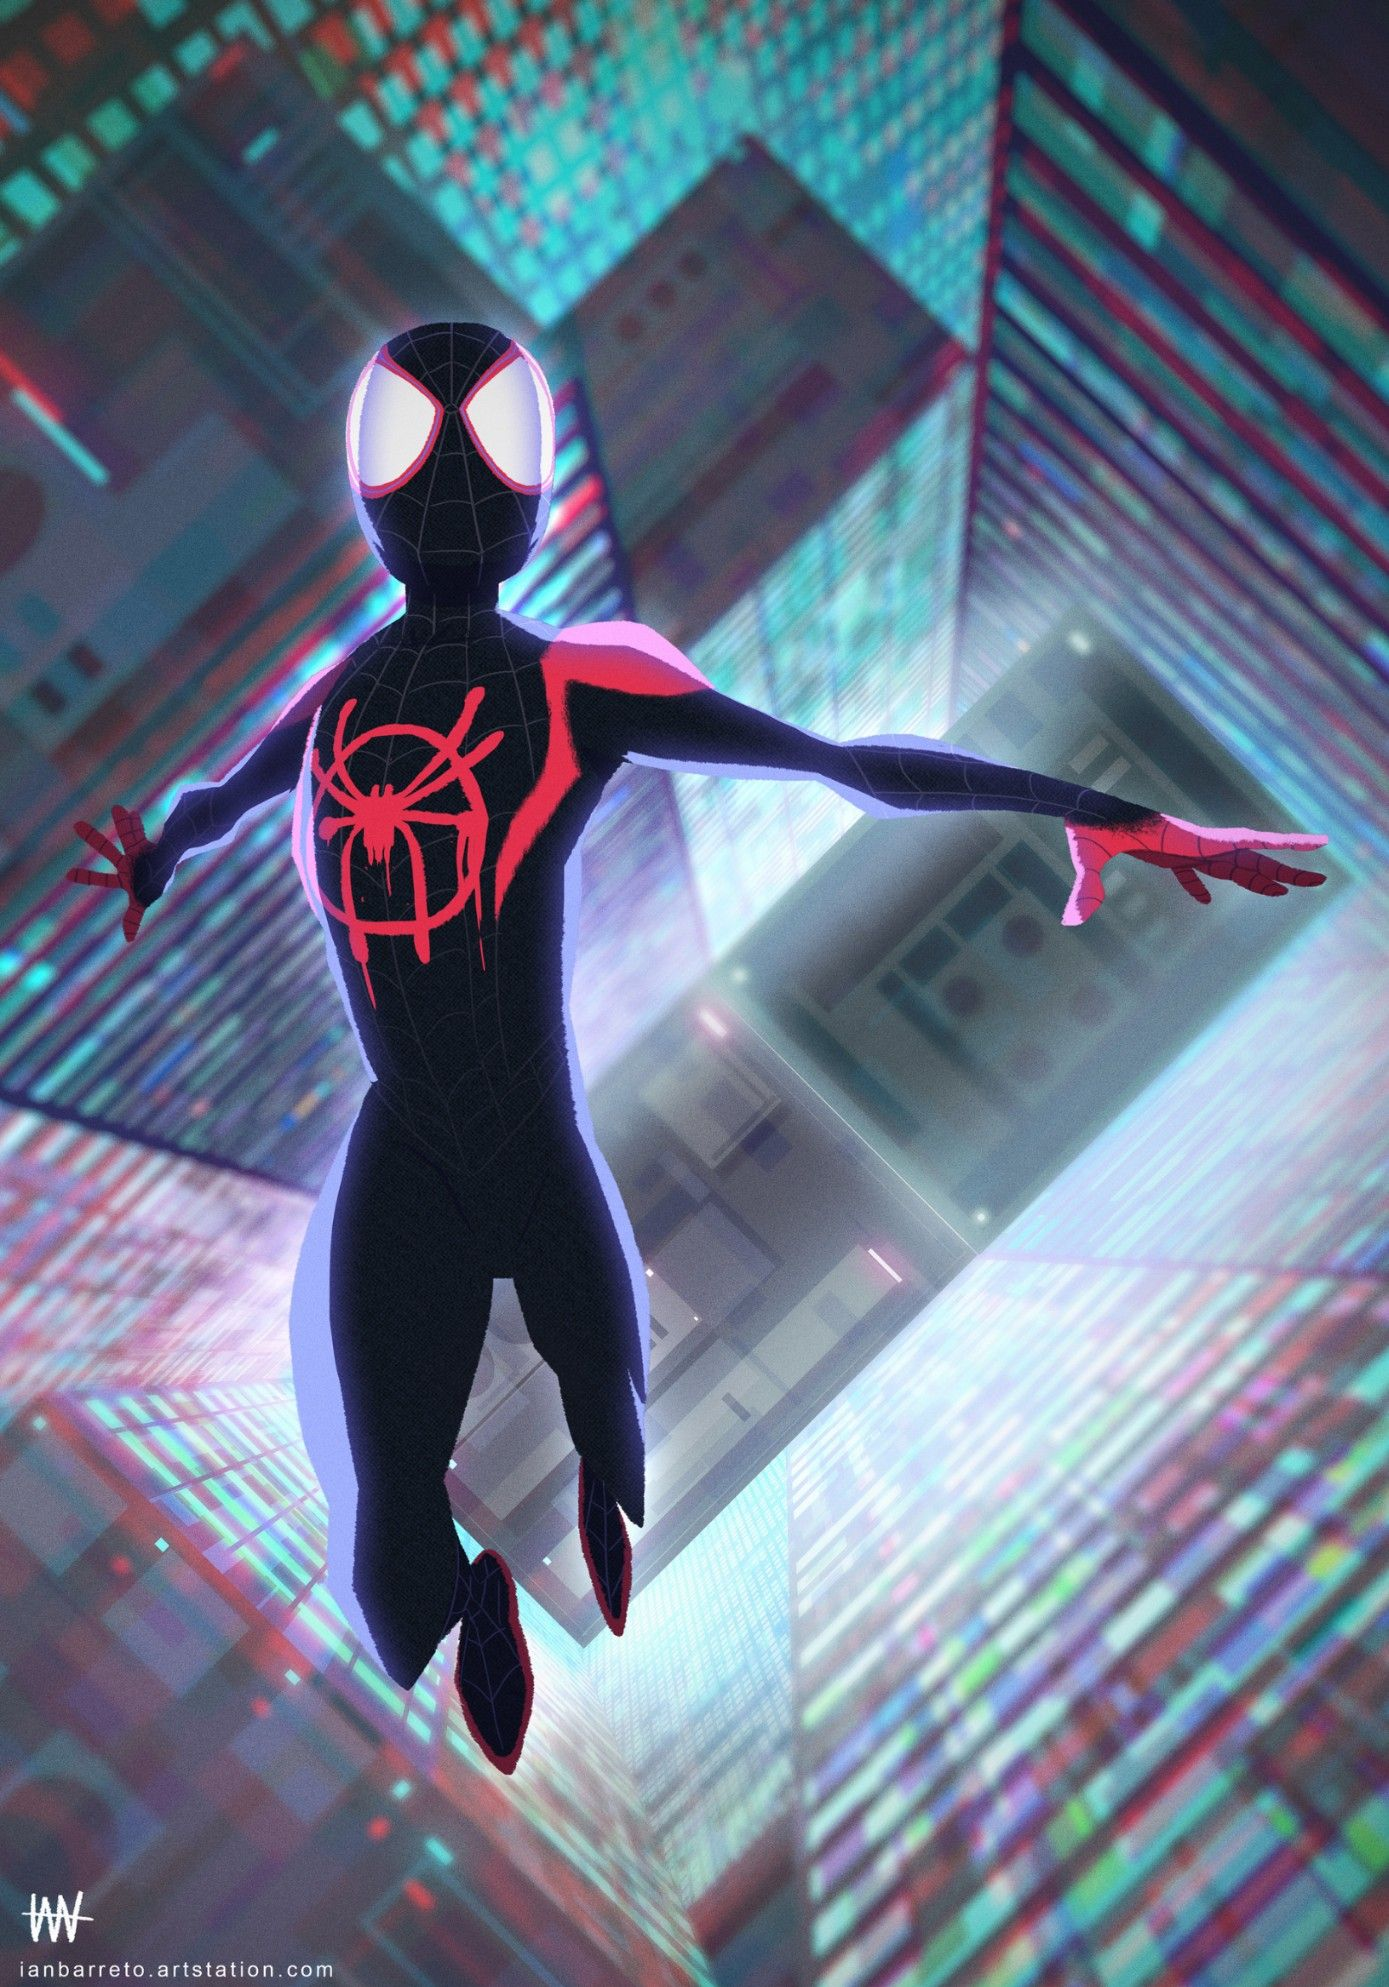 Spider Man Into The Spider Verse Spiderman Marvel Spiderman Miles Morales Spiderman